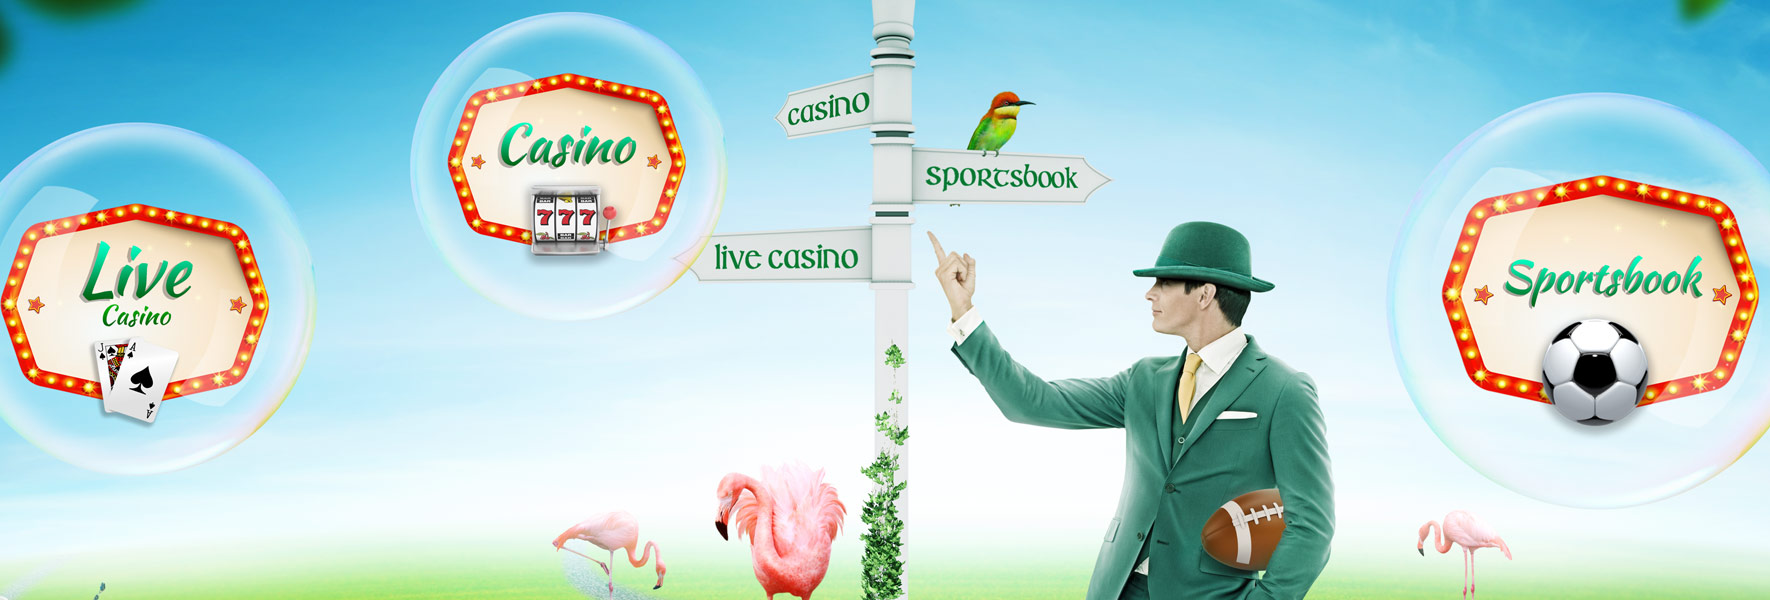 free slots online casino sic bo